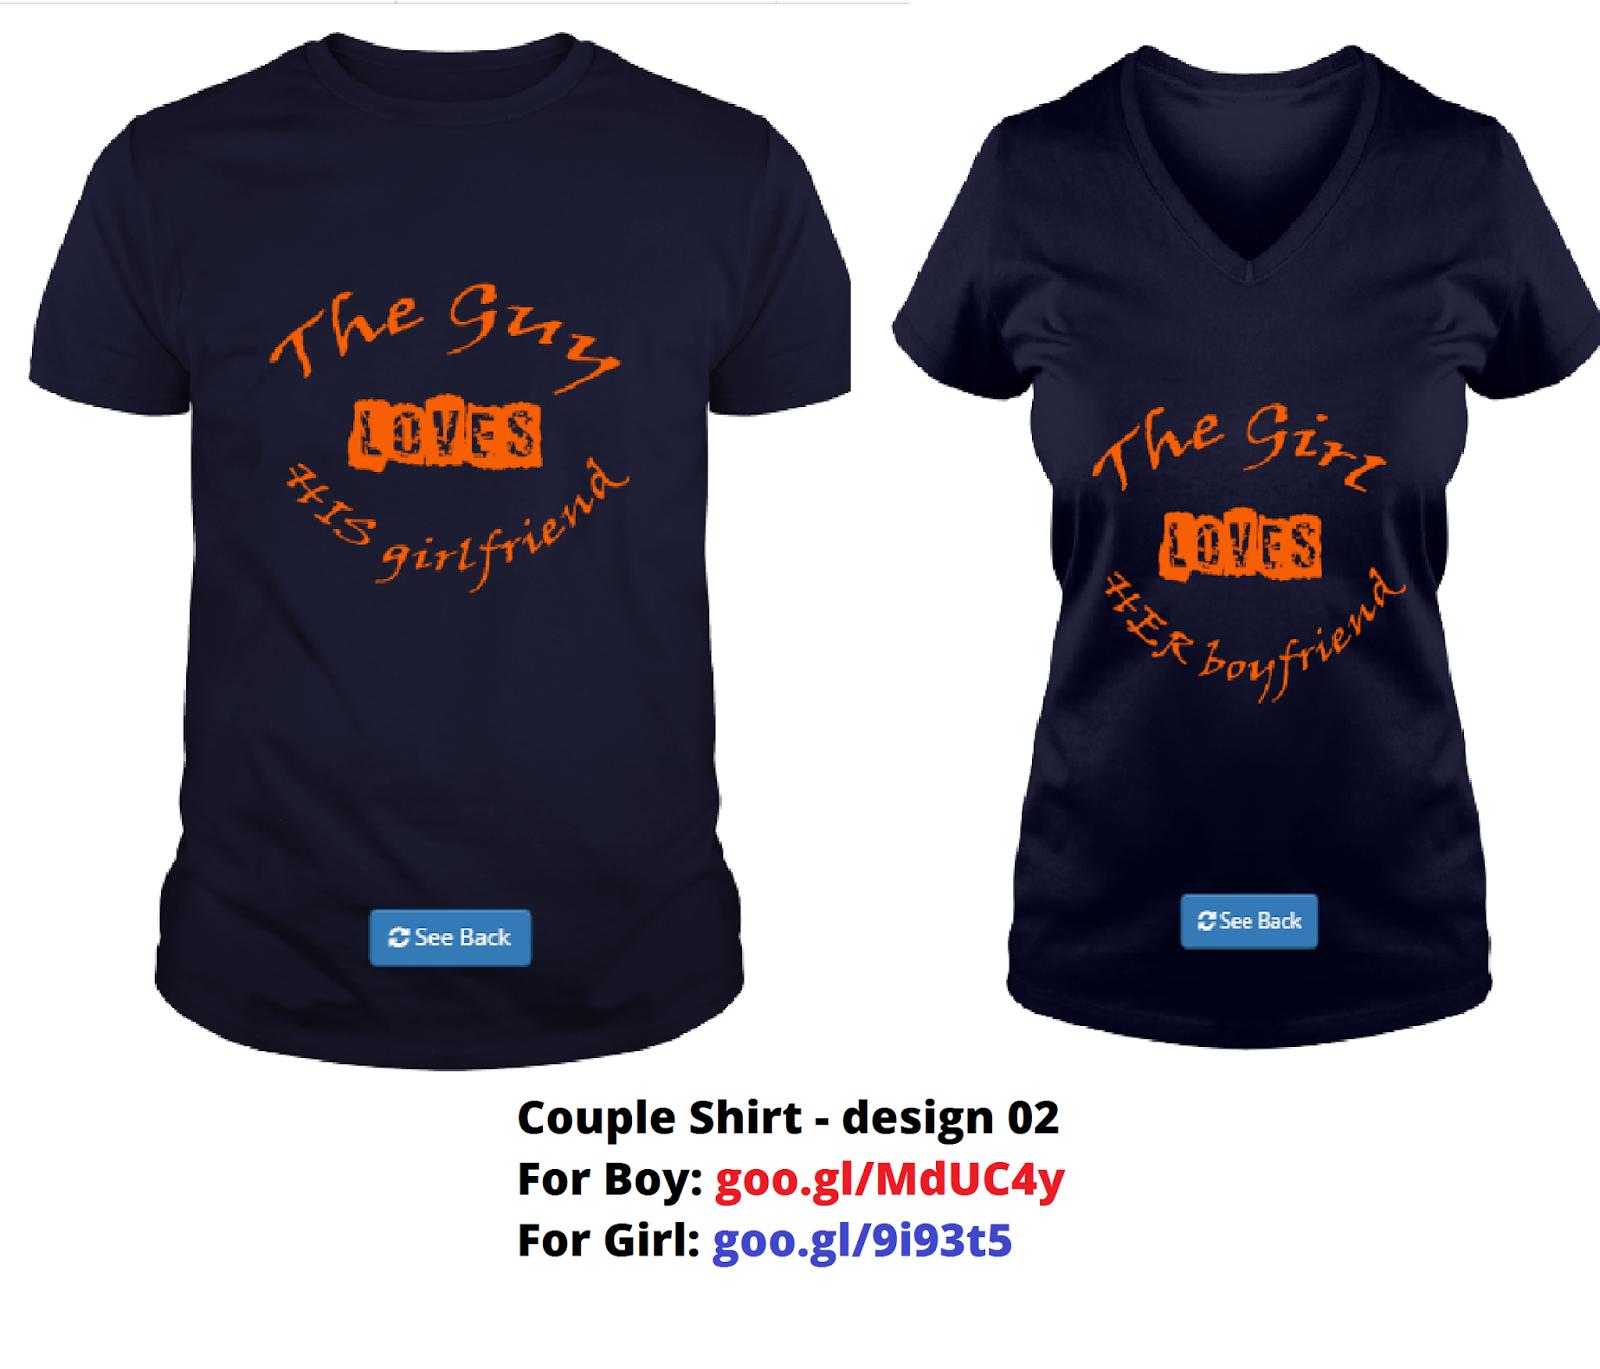 Cartoon Couple Design Tees Shirts Couple Tee Tops T Shirt: 100 Love Couple T Shirts Design